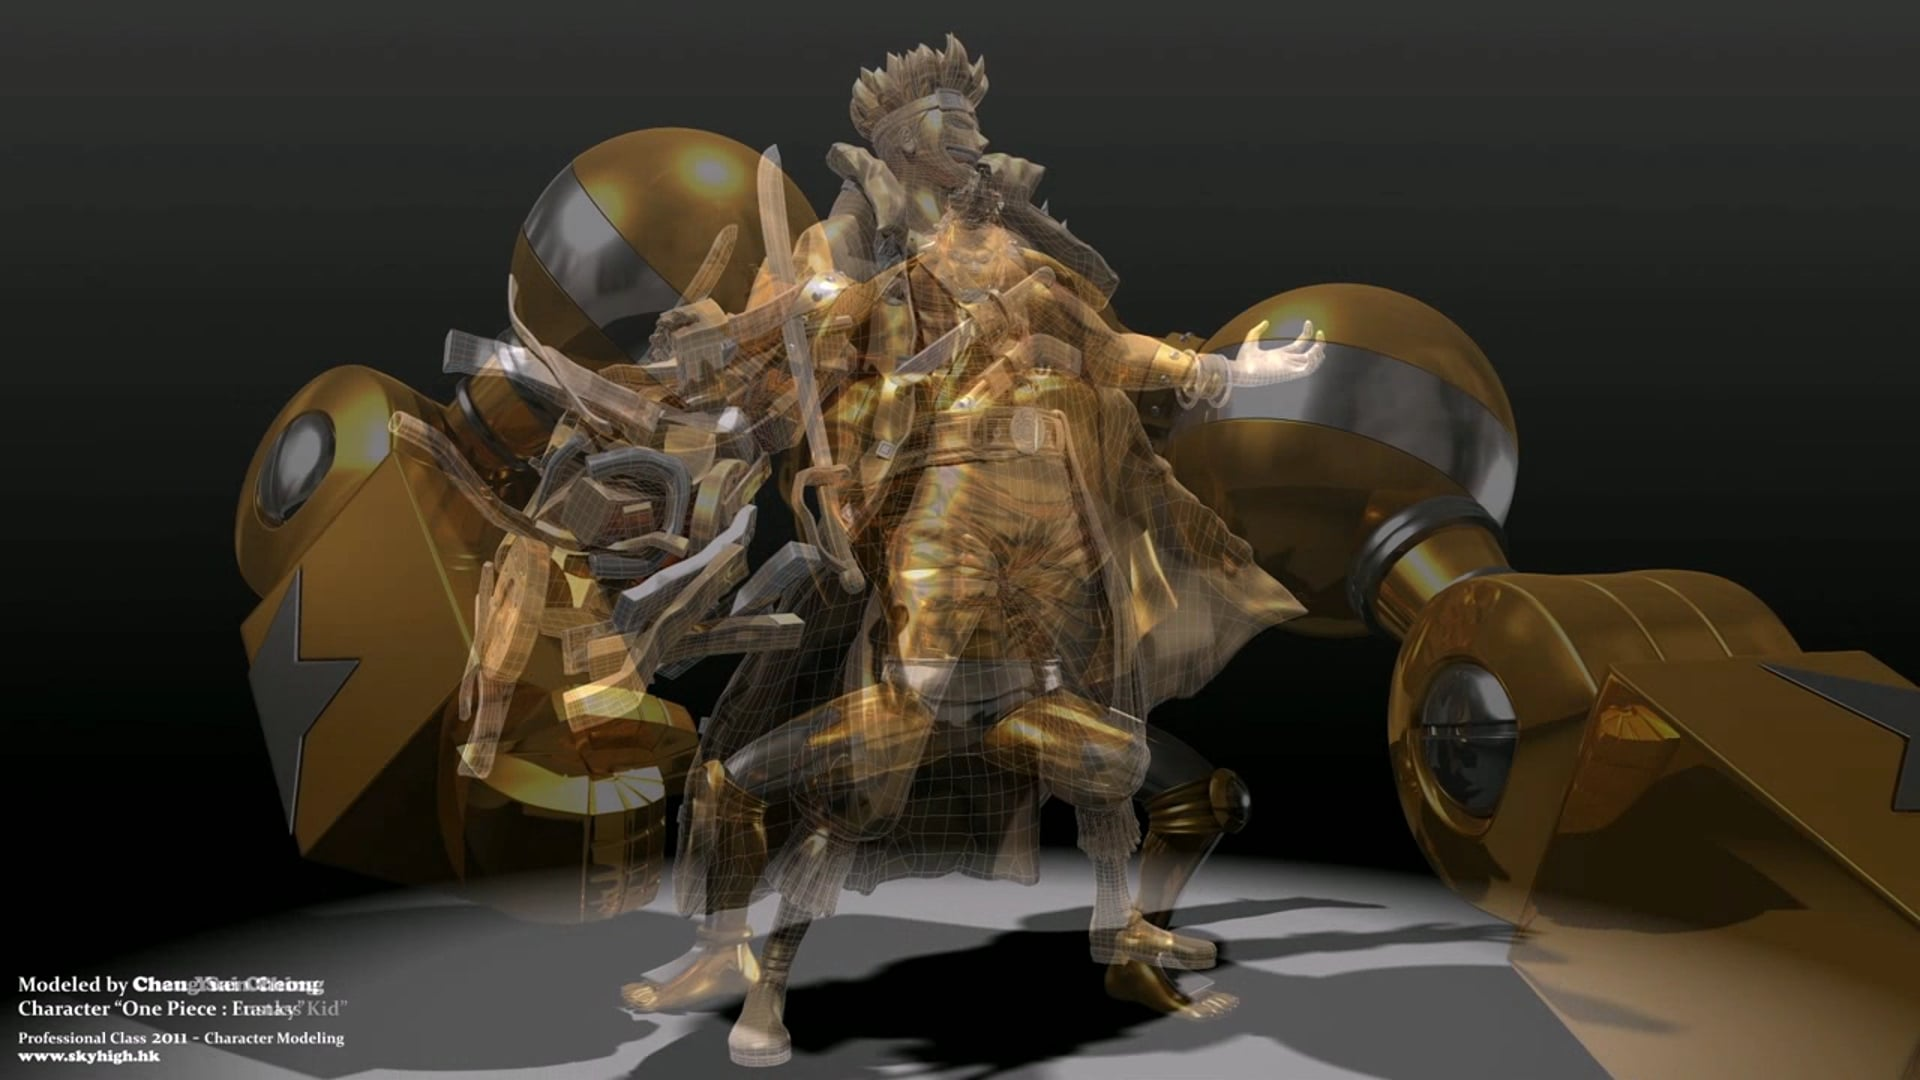 APAS - Professional in 3D Modeling